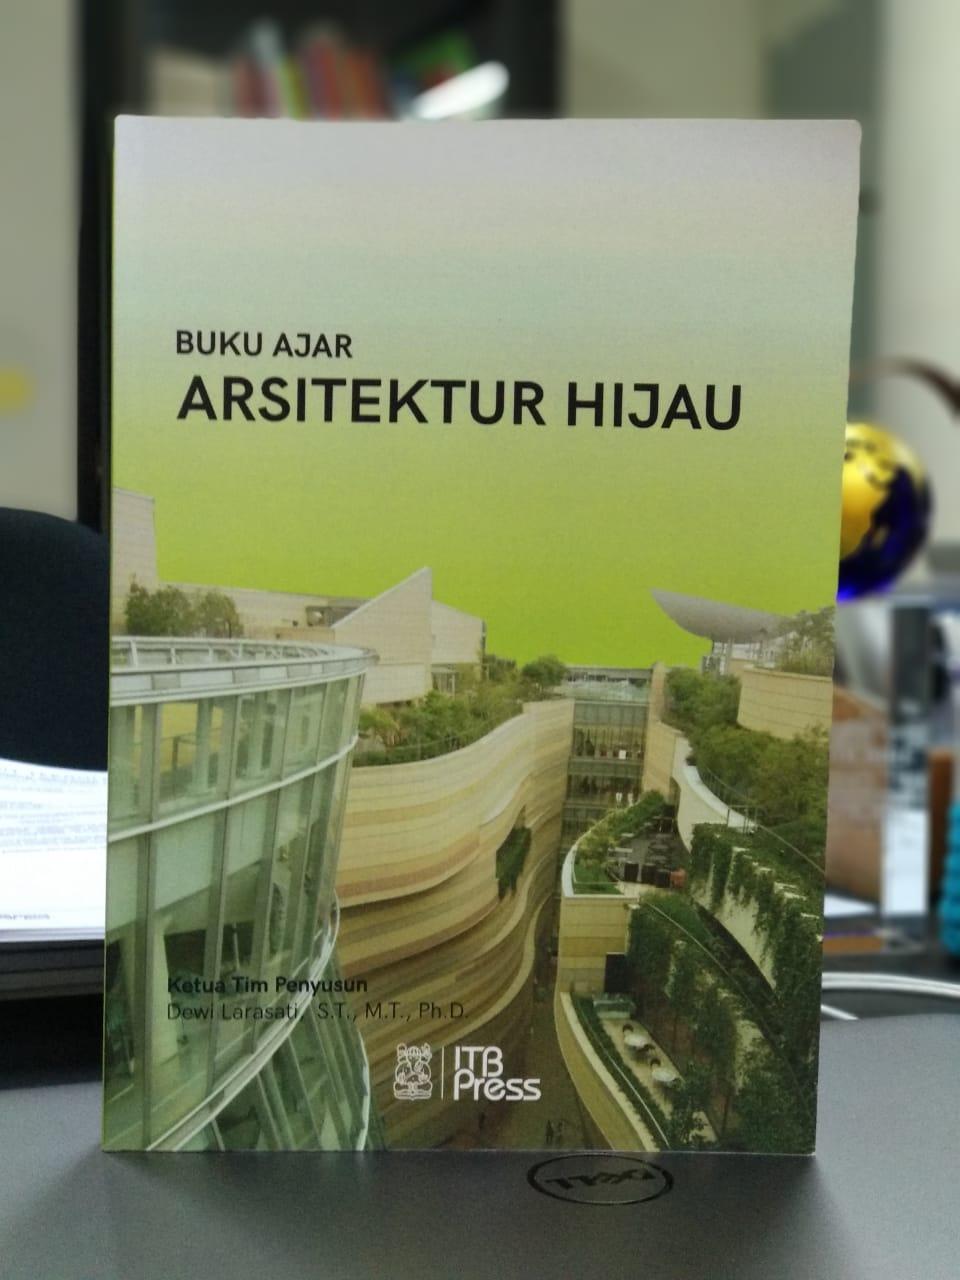 Buku Arsitektur Hijau